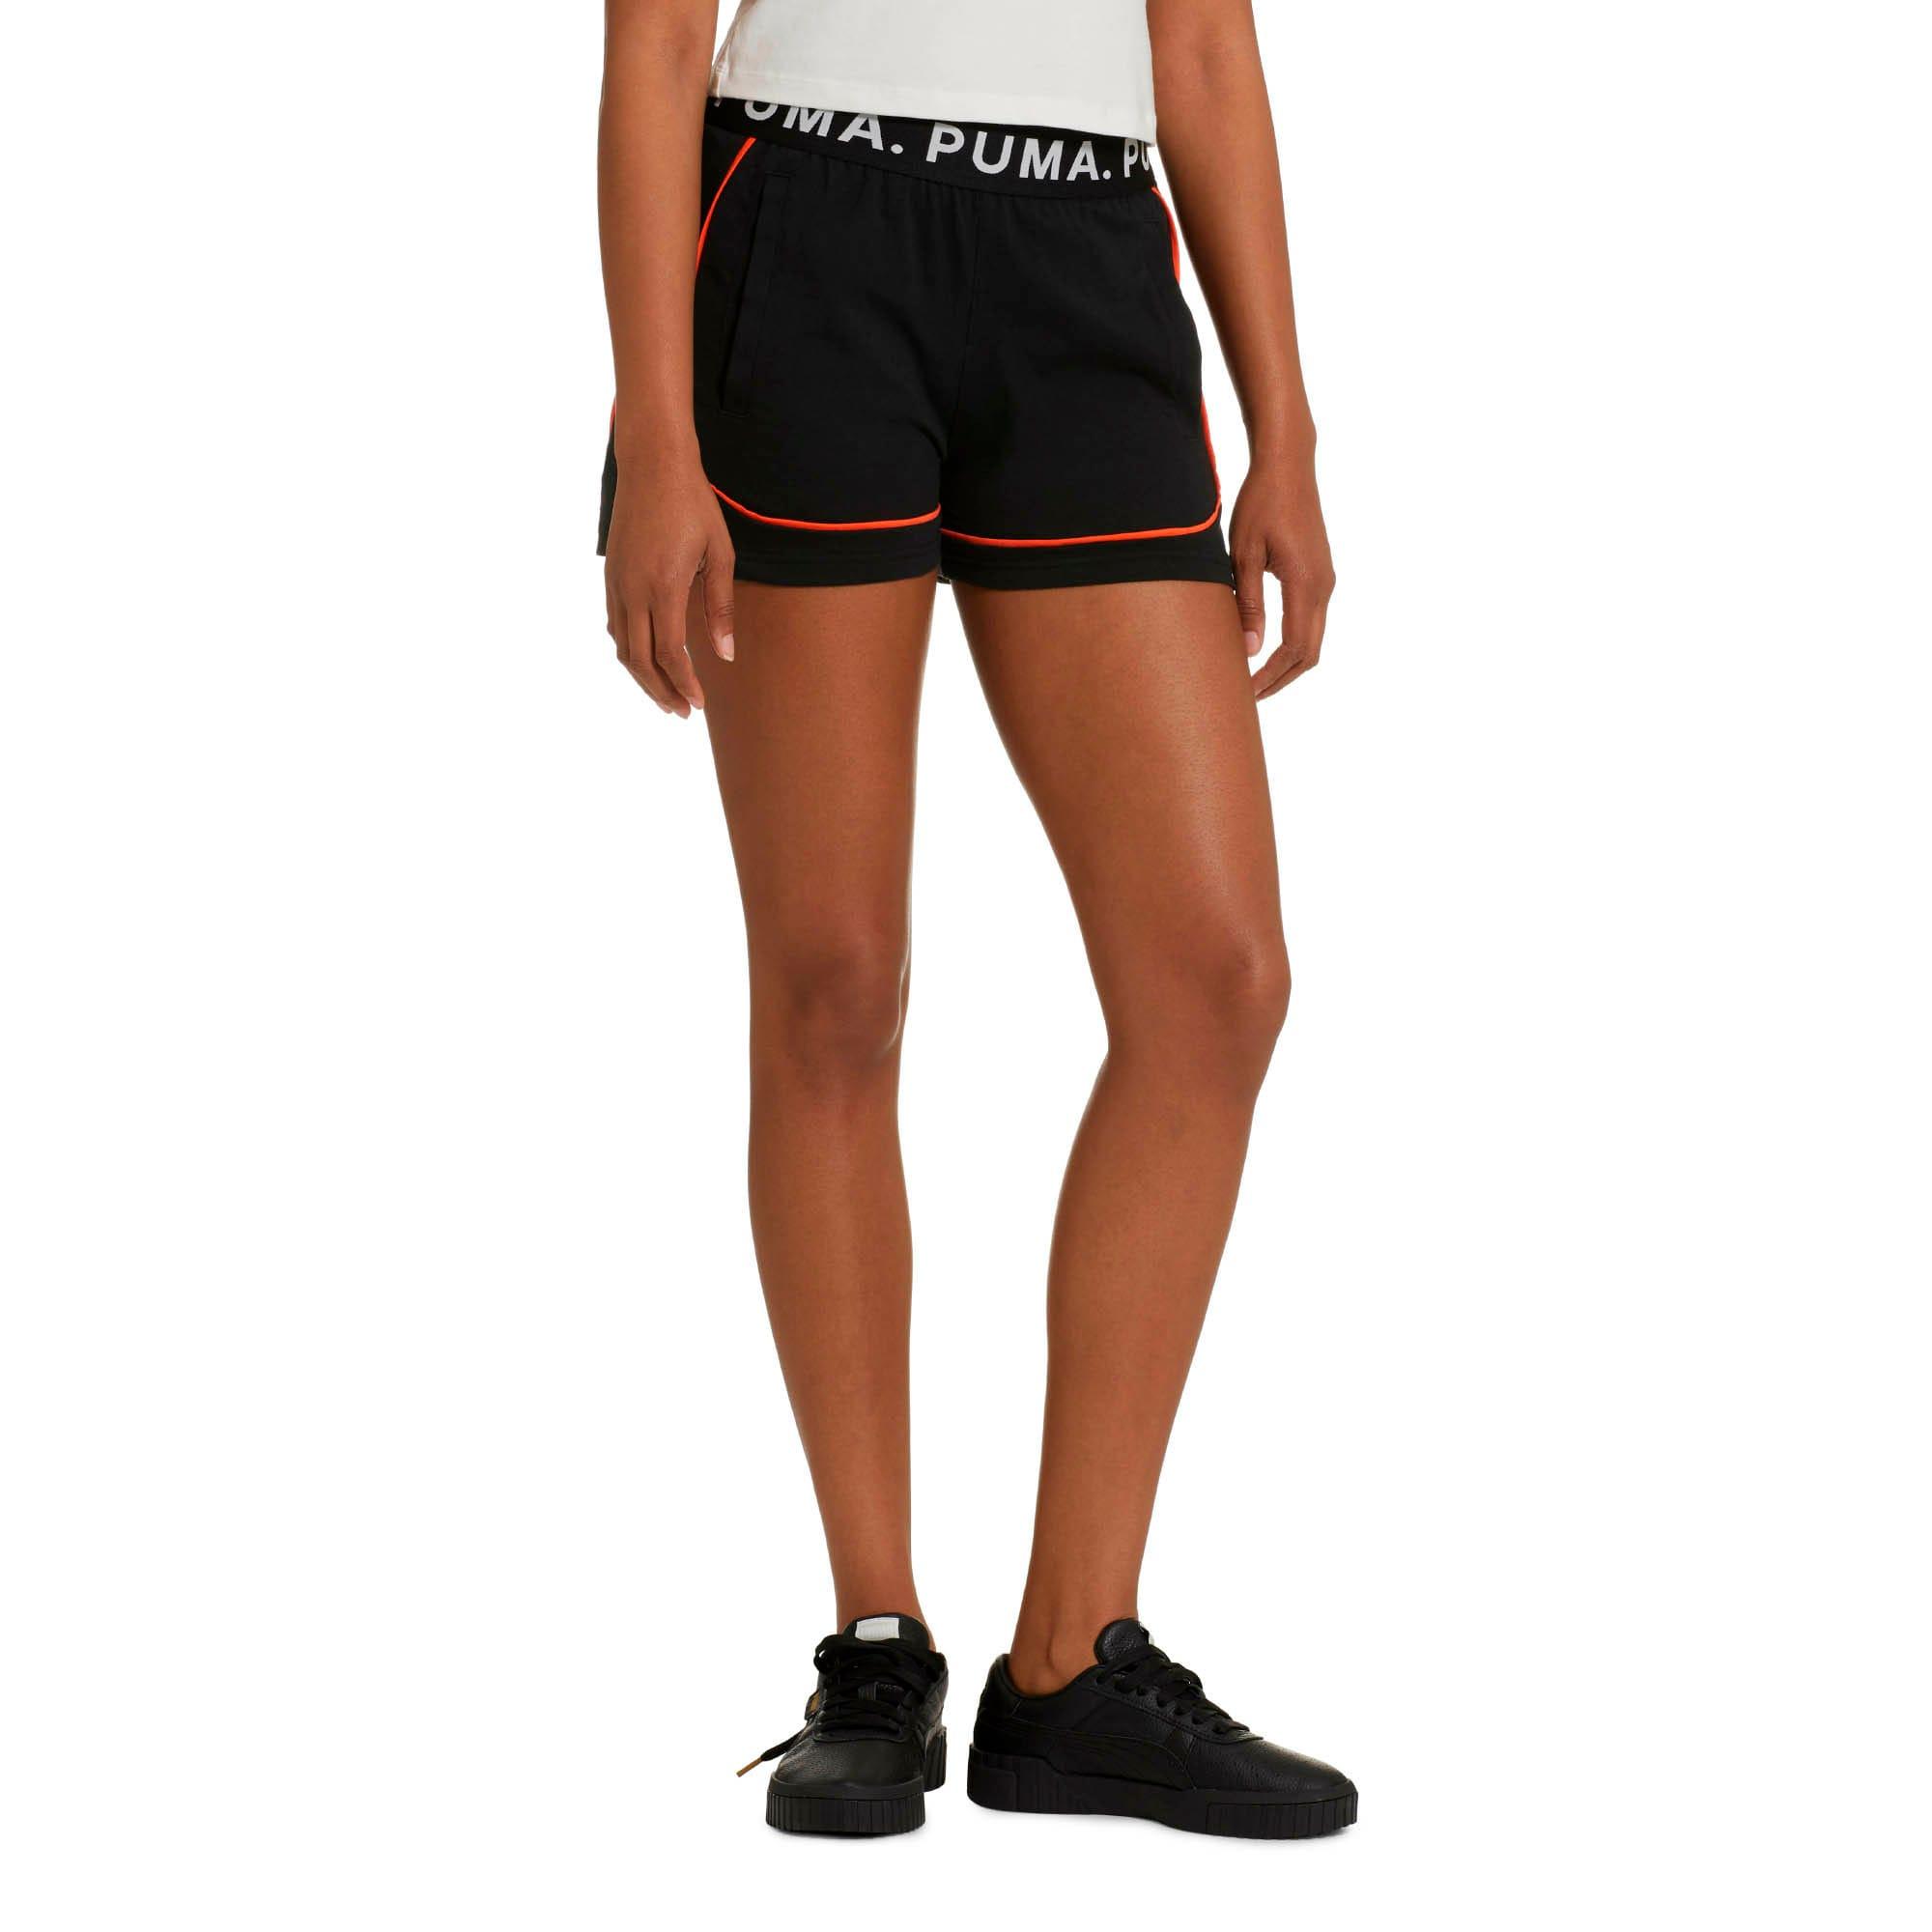 Miniatura 1 de Shorts Chase para mujer, Cotton Black, mediano